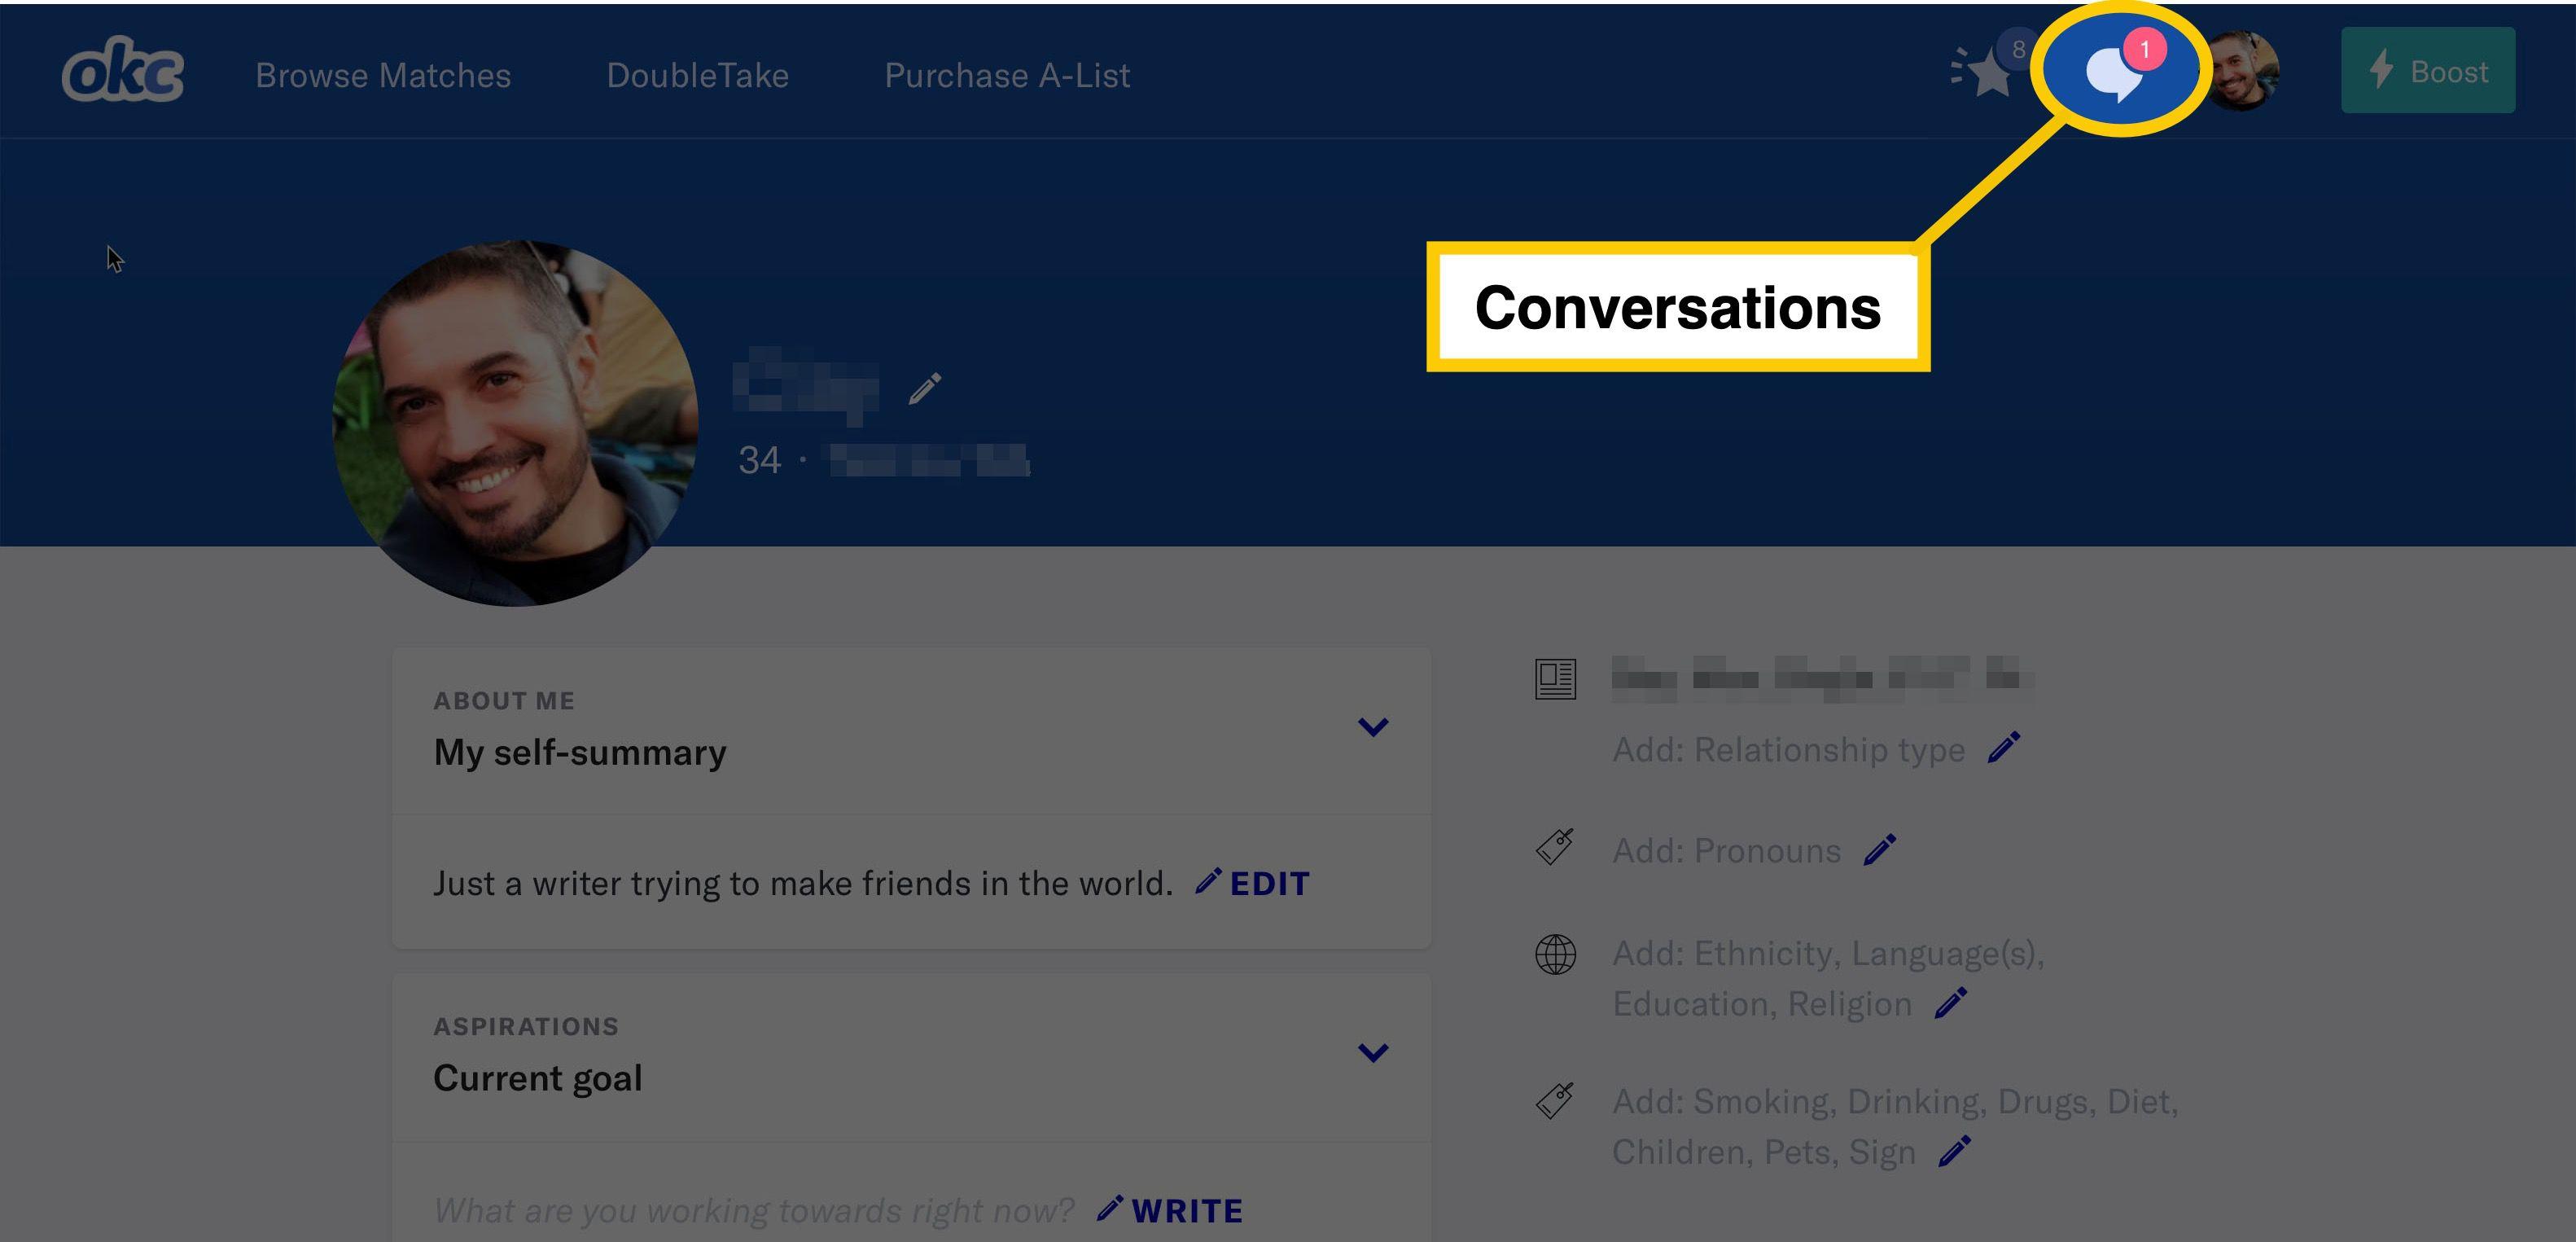 Okcupid pc app  Download OkCupid Dating For PC On Windows 10, 8, 7